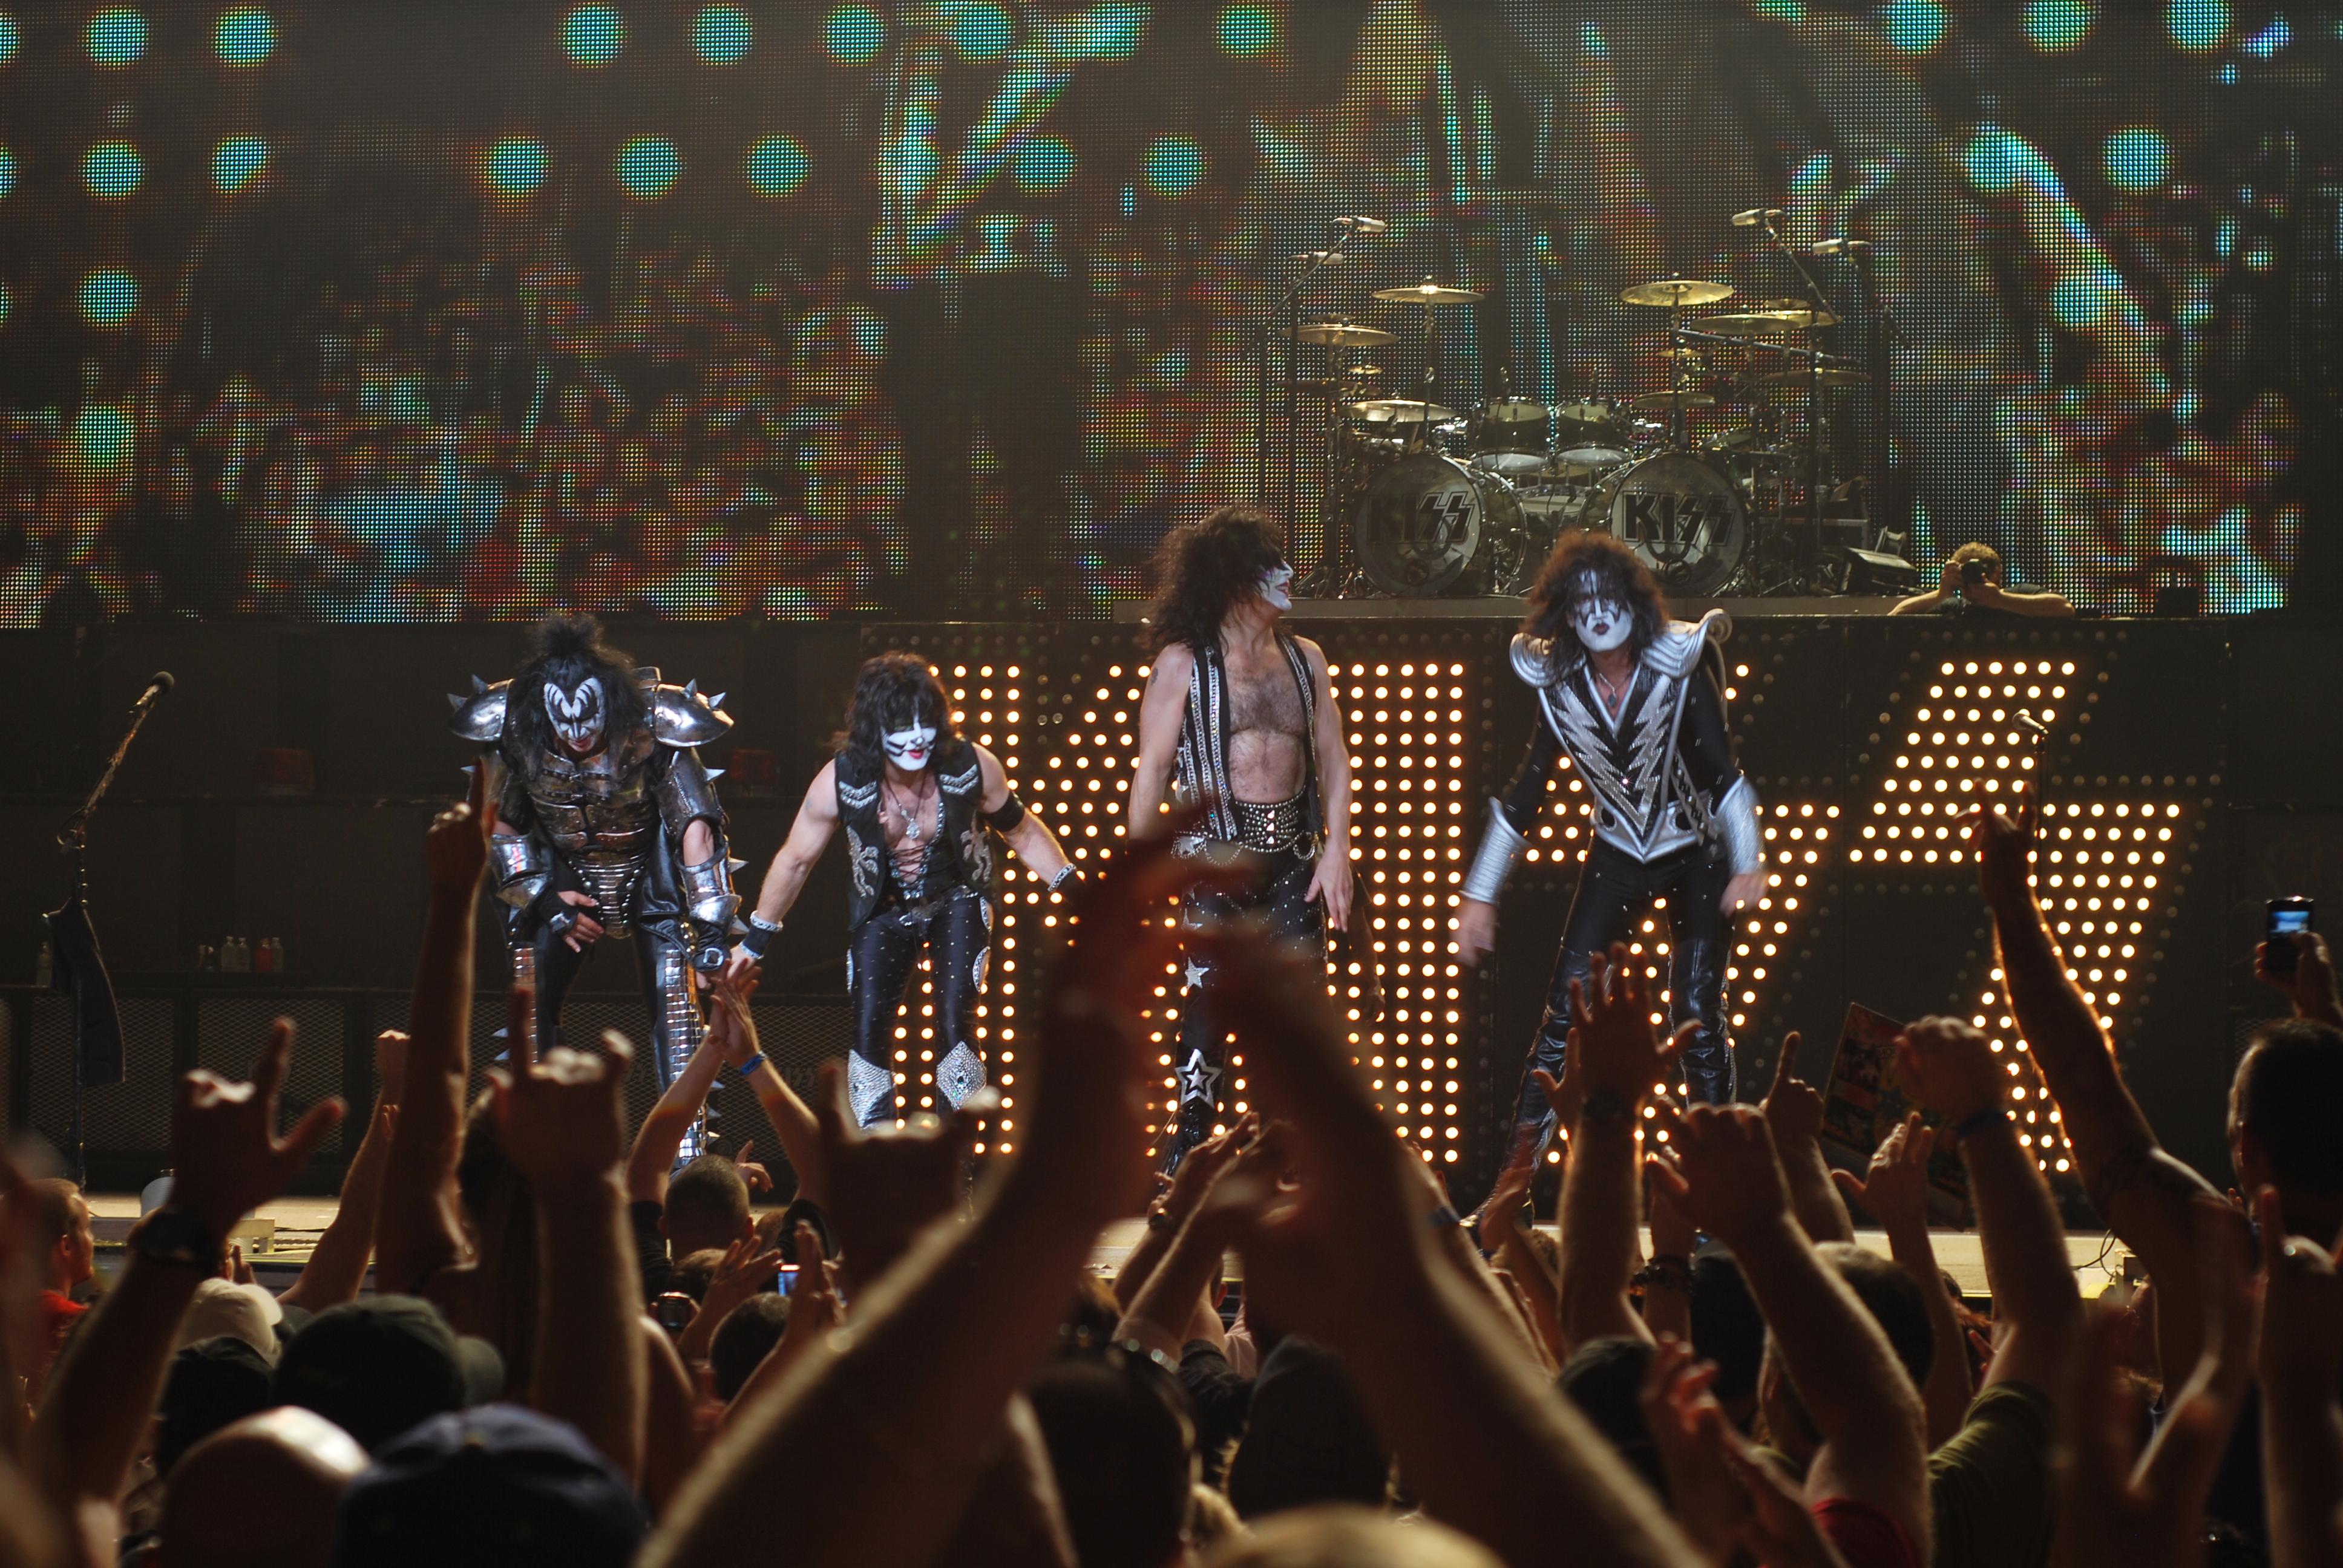 Kiss heavy metal rock bands concert Wallpaper Wallpapers 3872x2592